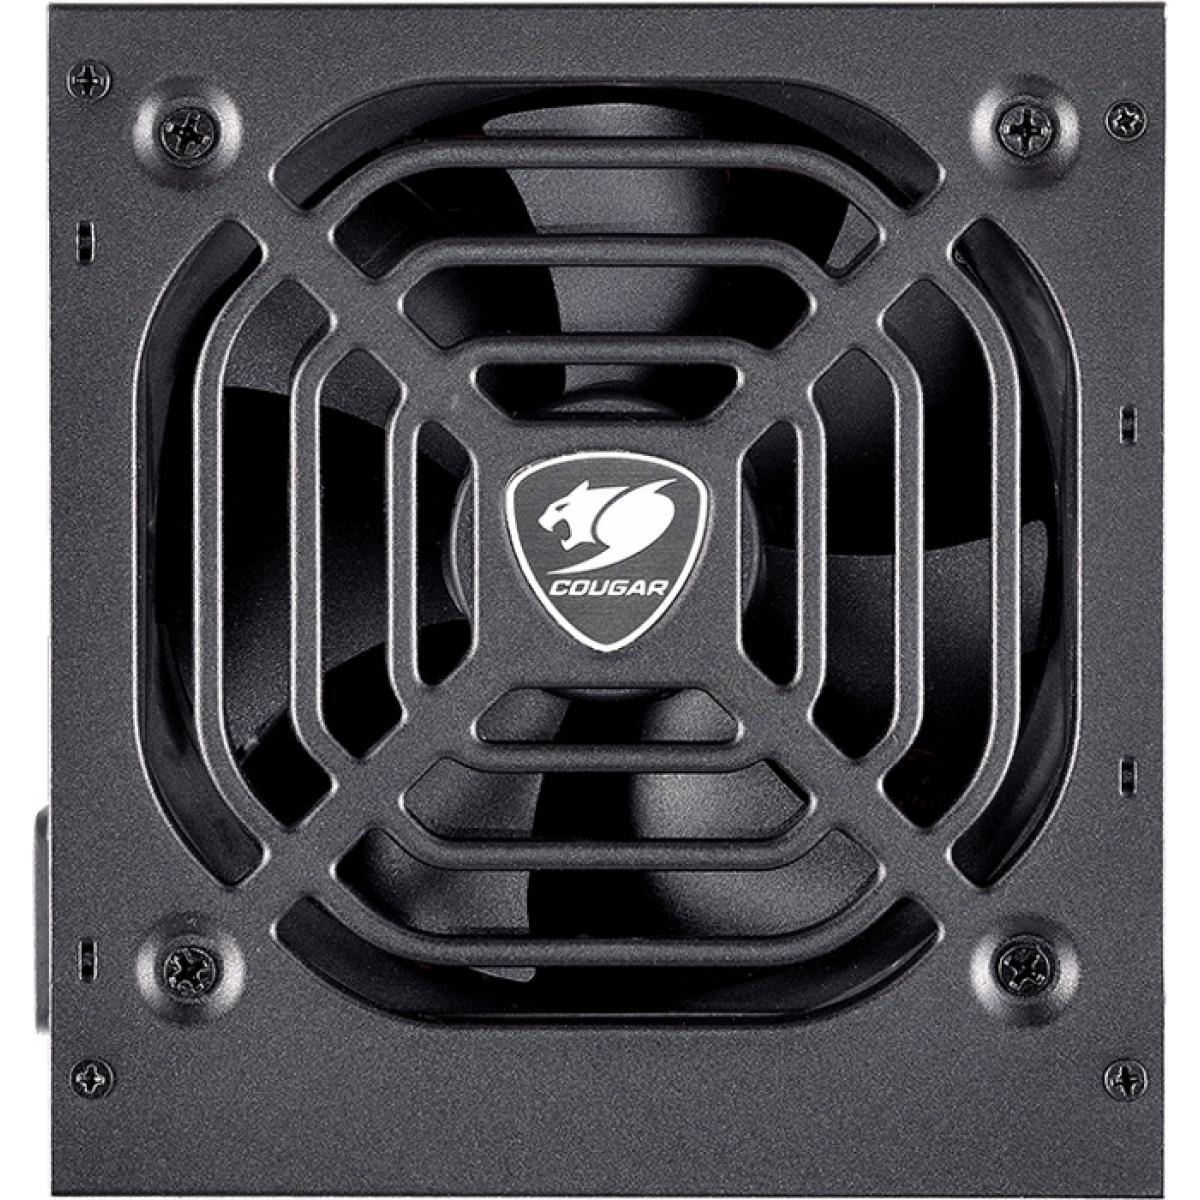 Fonte Cougar VTC500 500W, 80 Plus White, PFC Ativo, 31VC050006P01